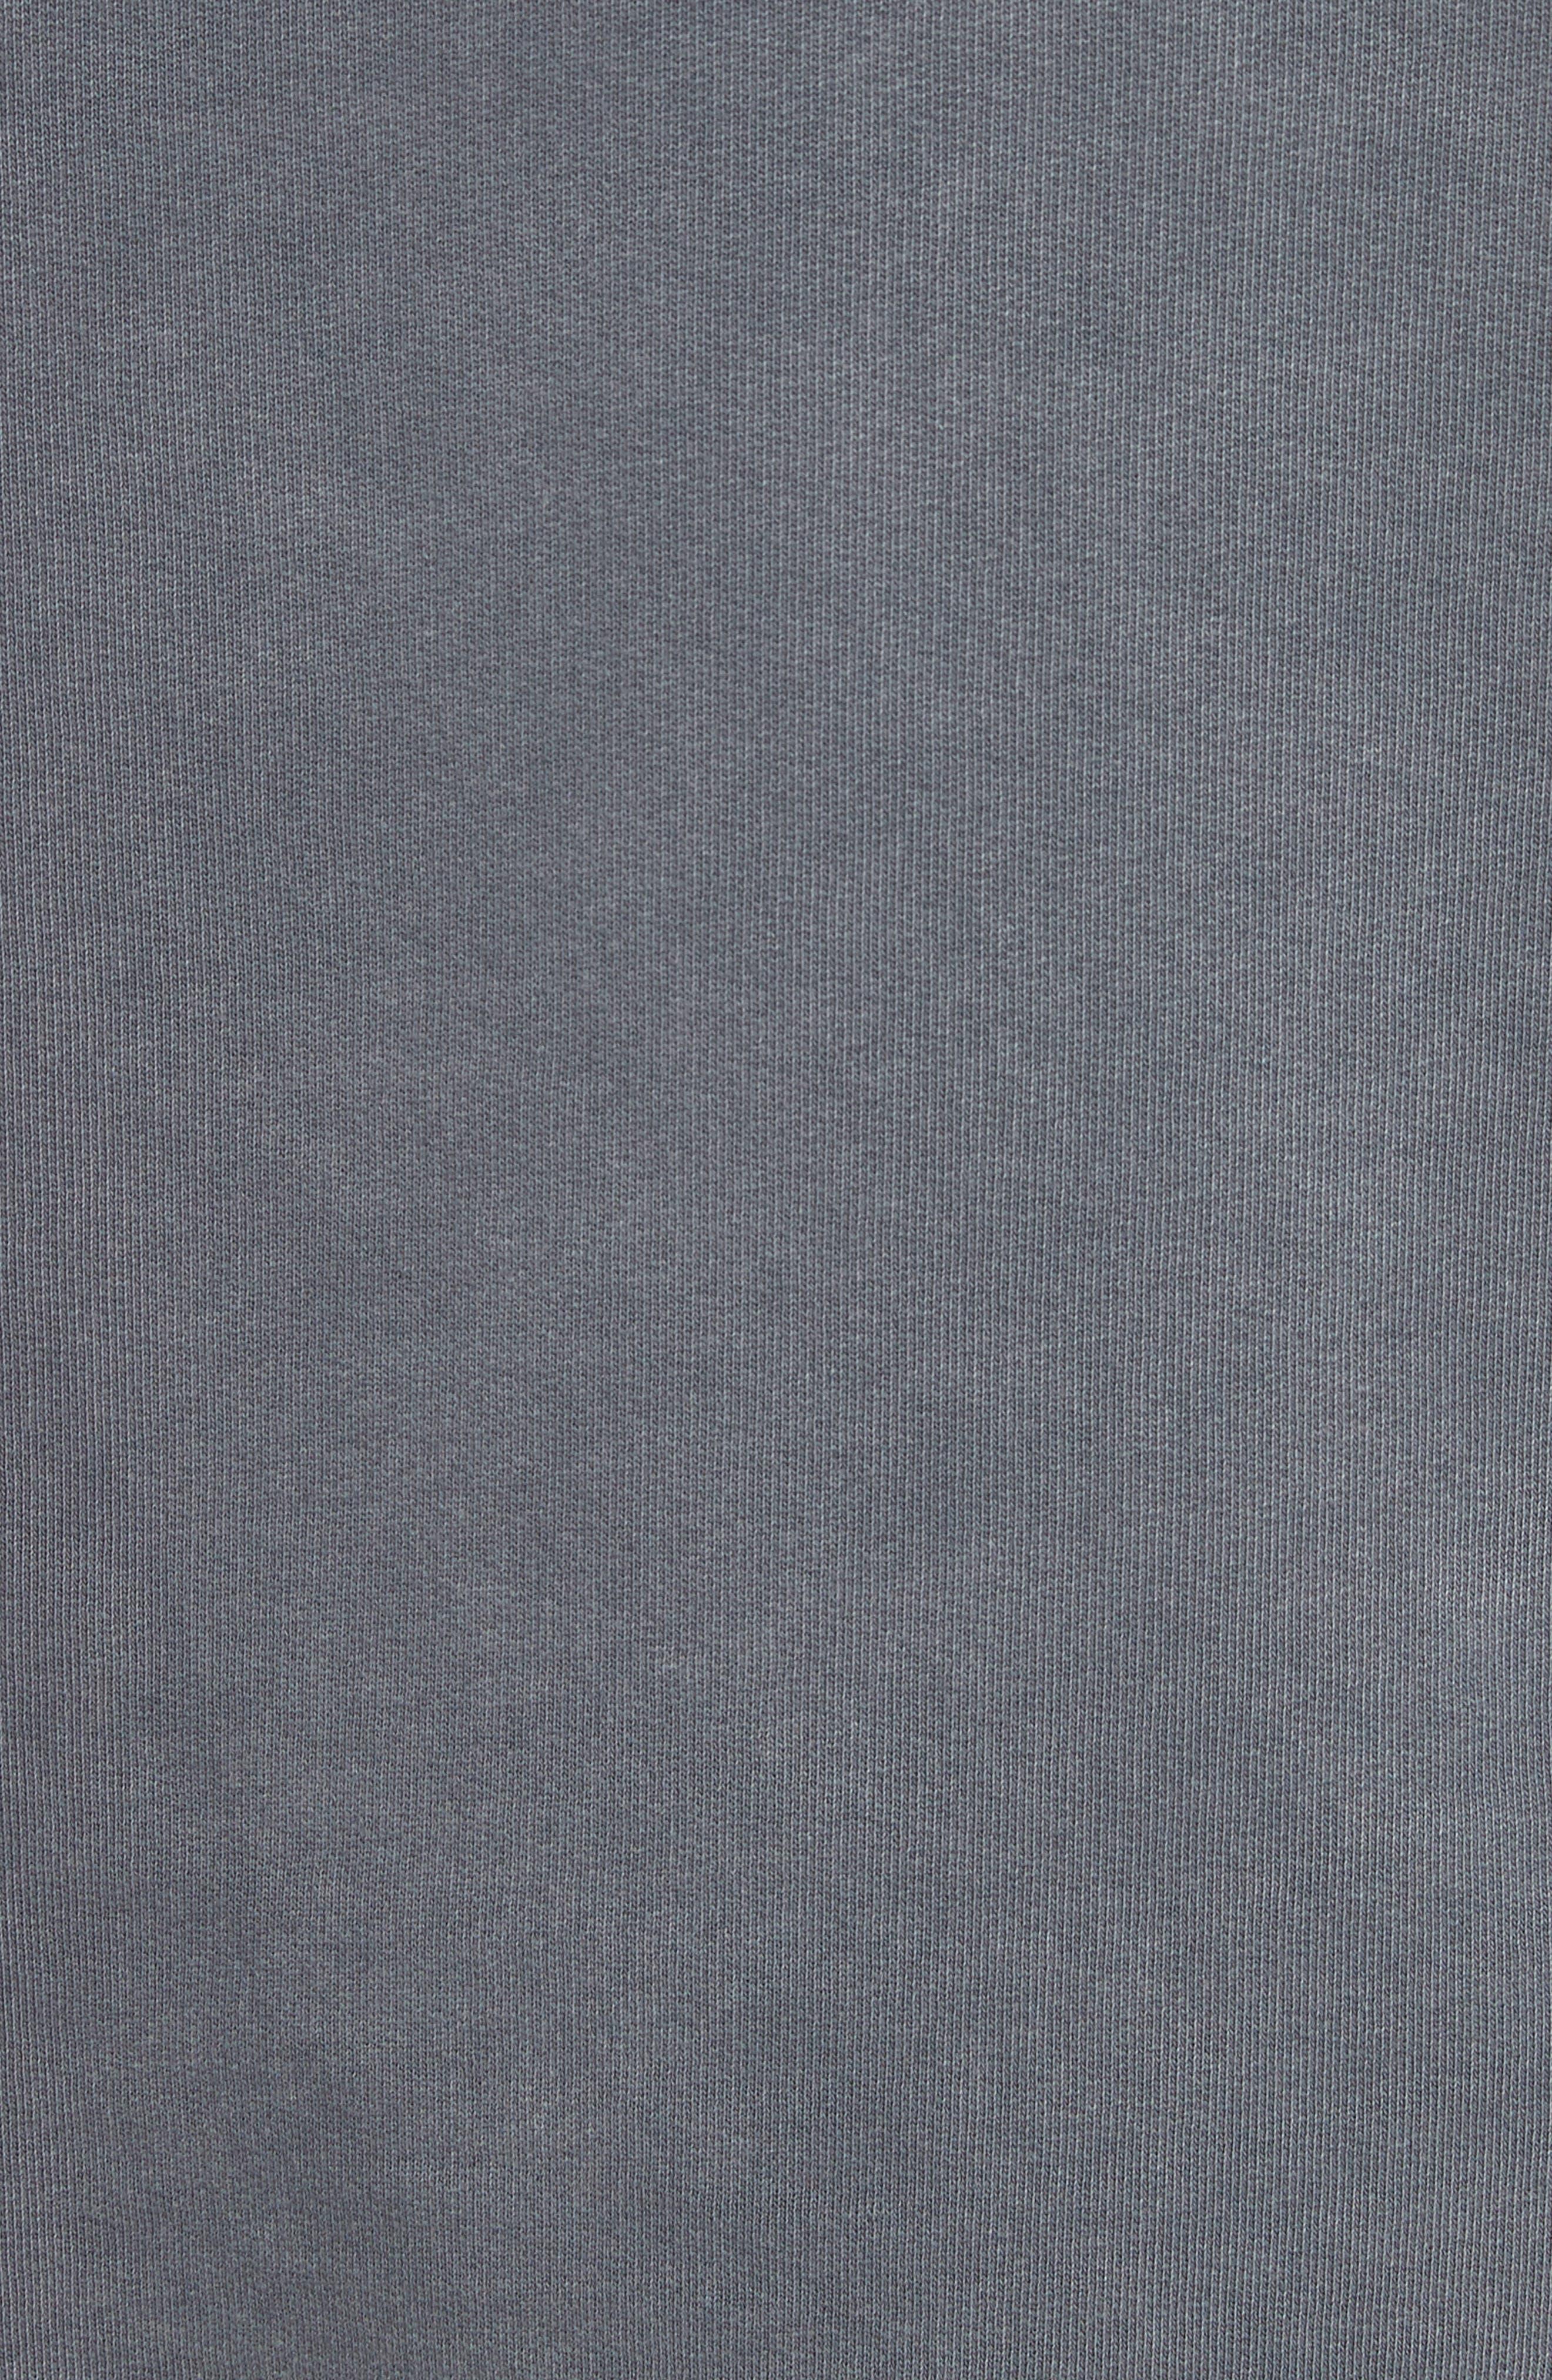 Fala Oversize Washed Hoodie,                             Alternate thumbnail 5, color,                             Black Wash